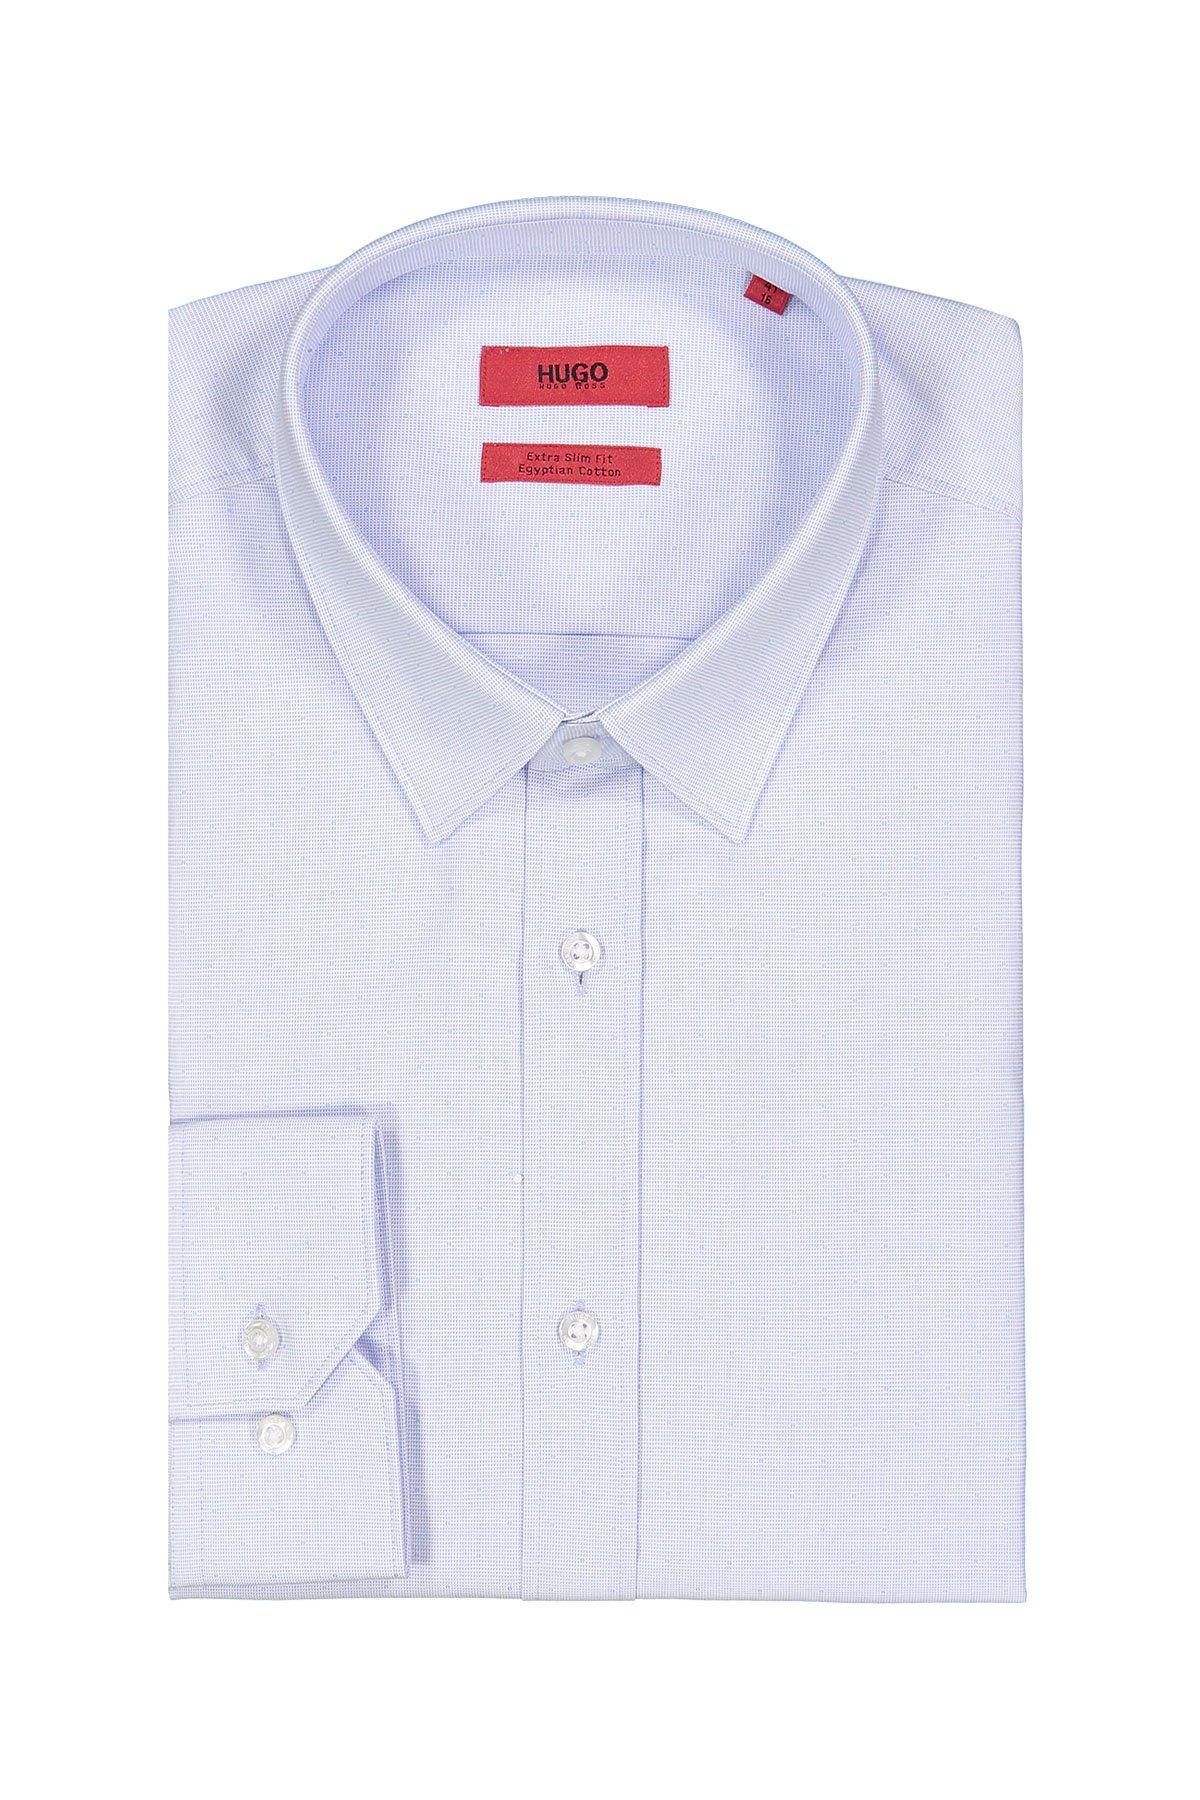 Camisa Hugo Boss, Extra slim fit, micro diseño celeste.